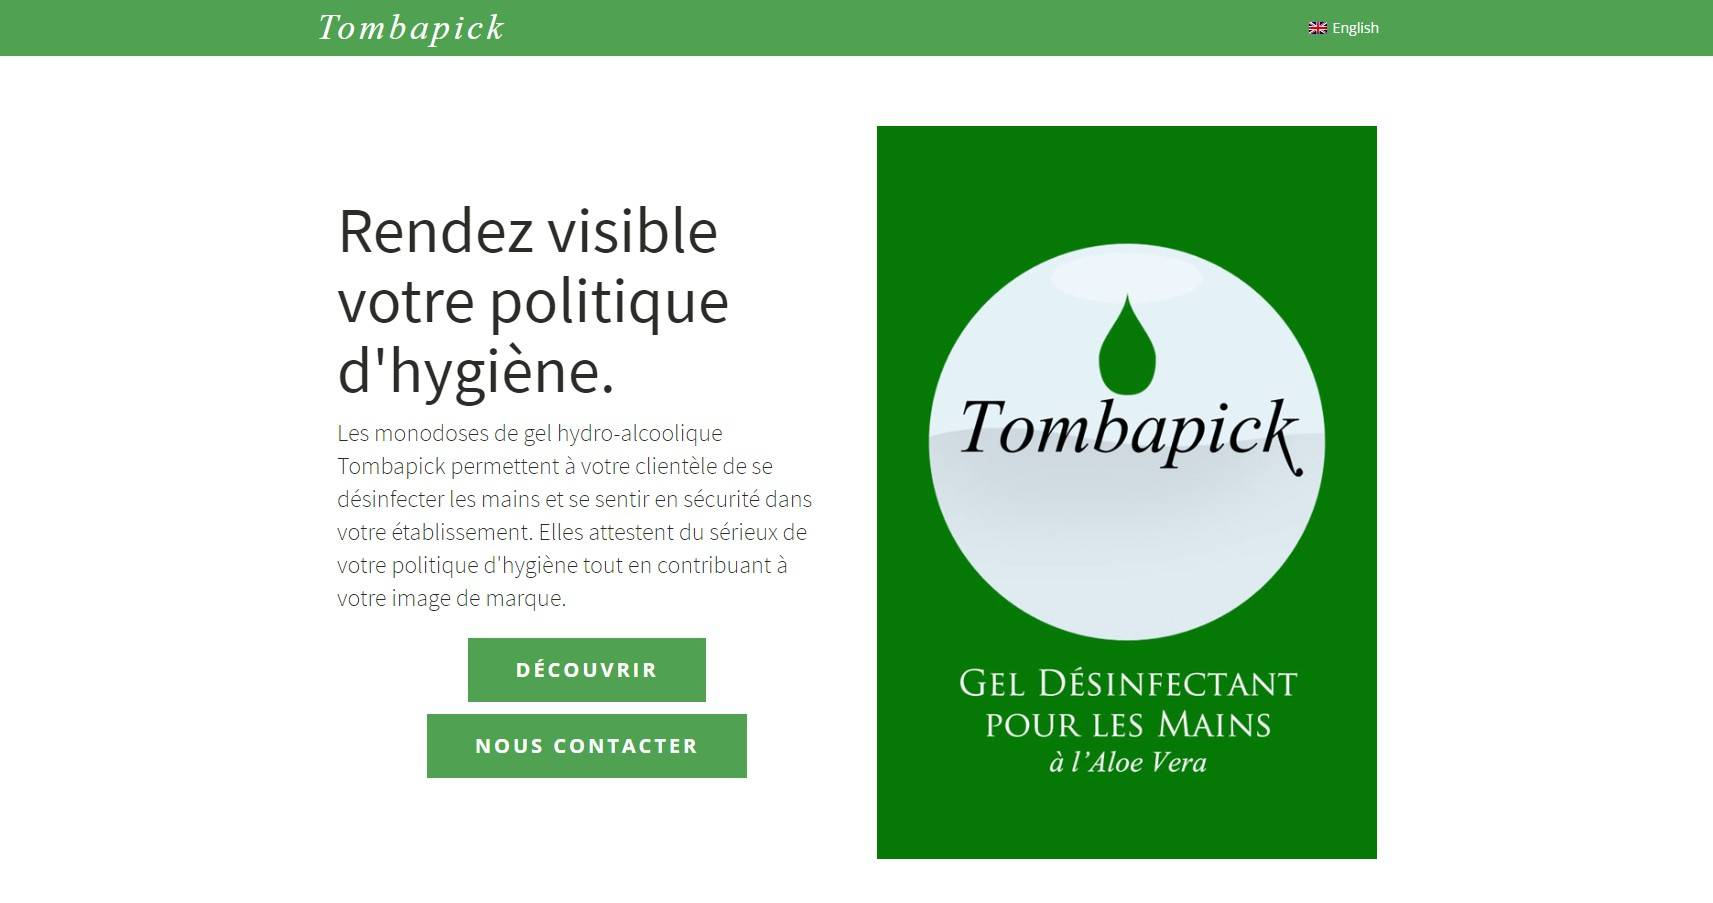 Tombapick